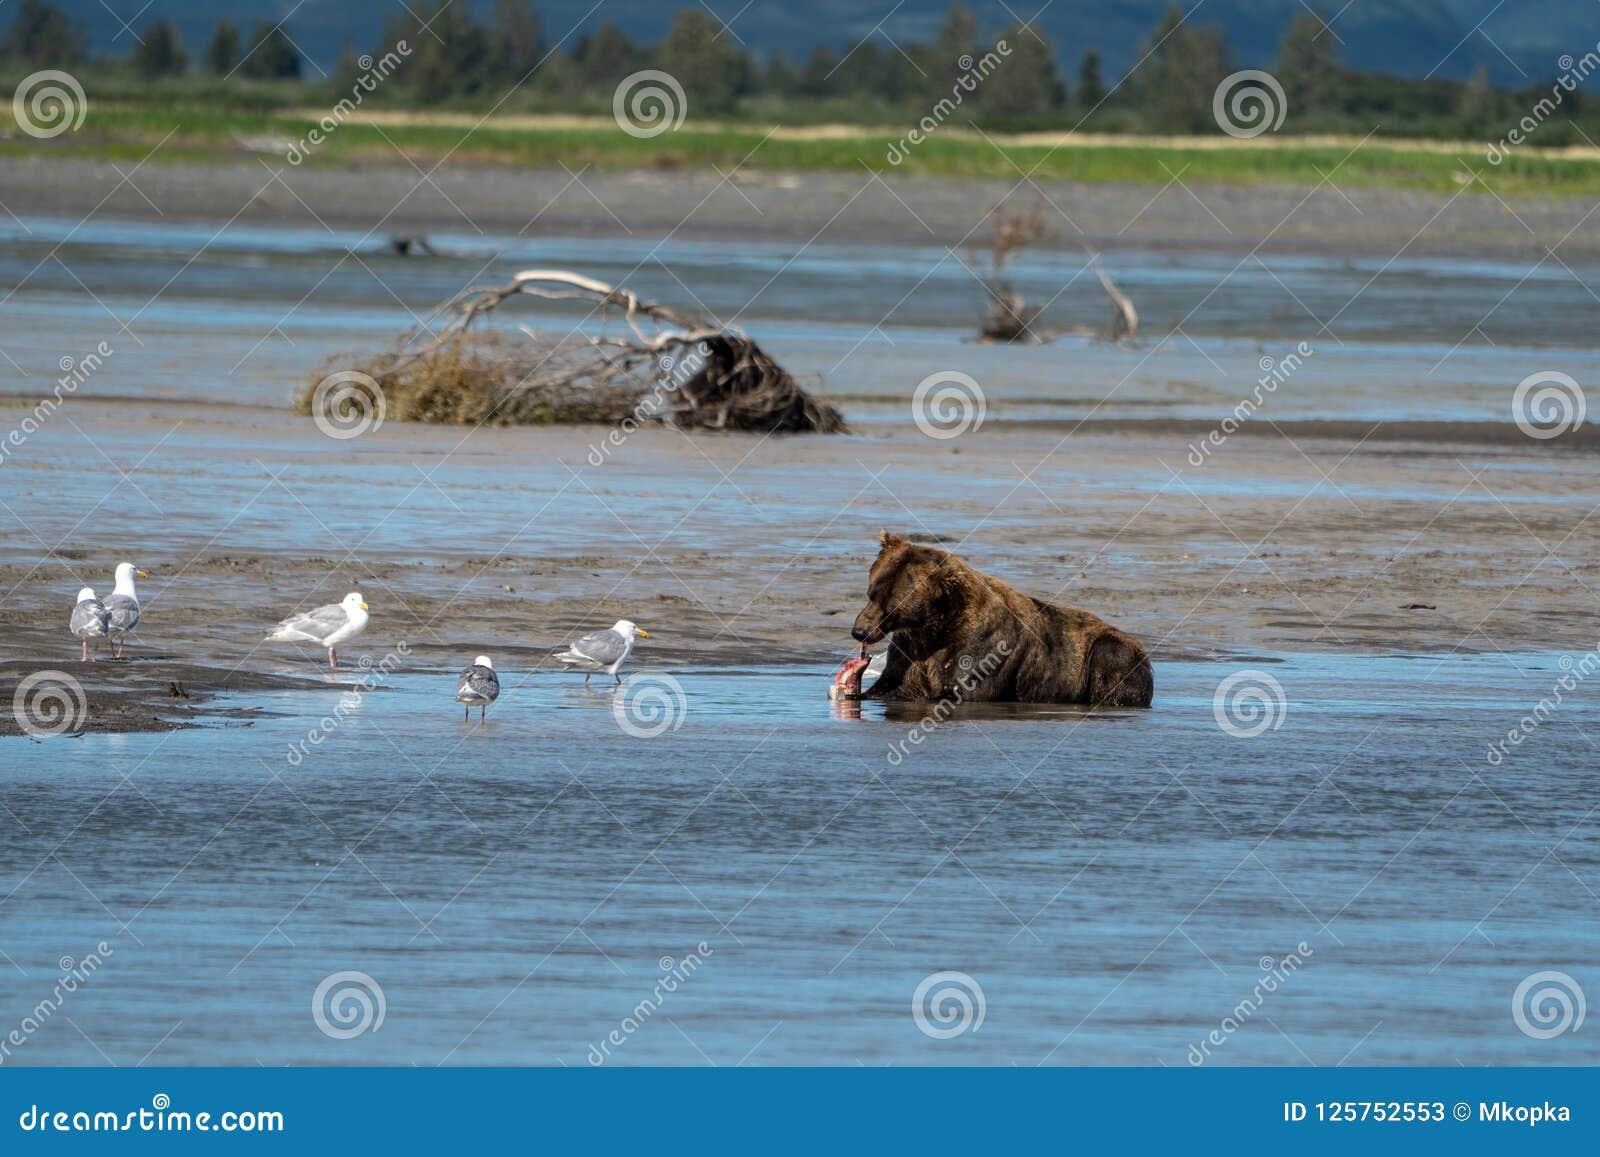 Alaskan coastal brown bear eats a salmon fish in Katmai National Park